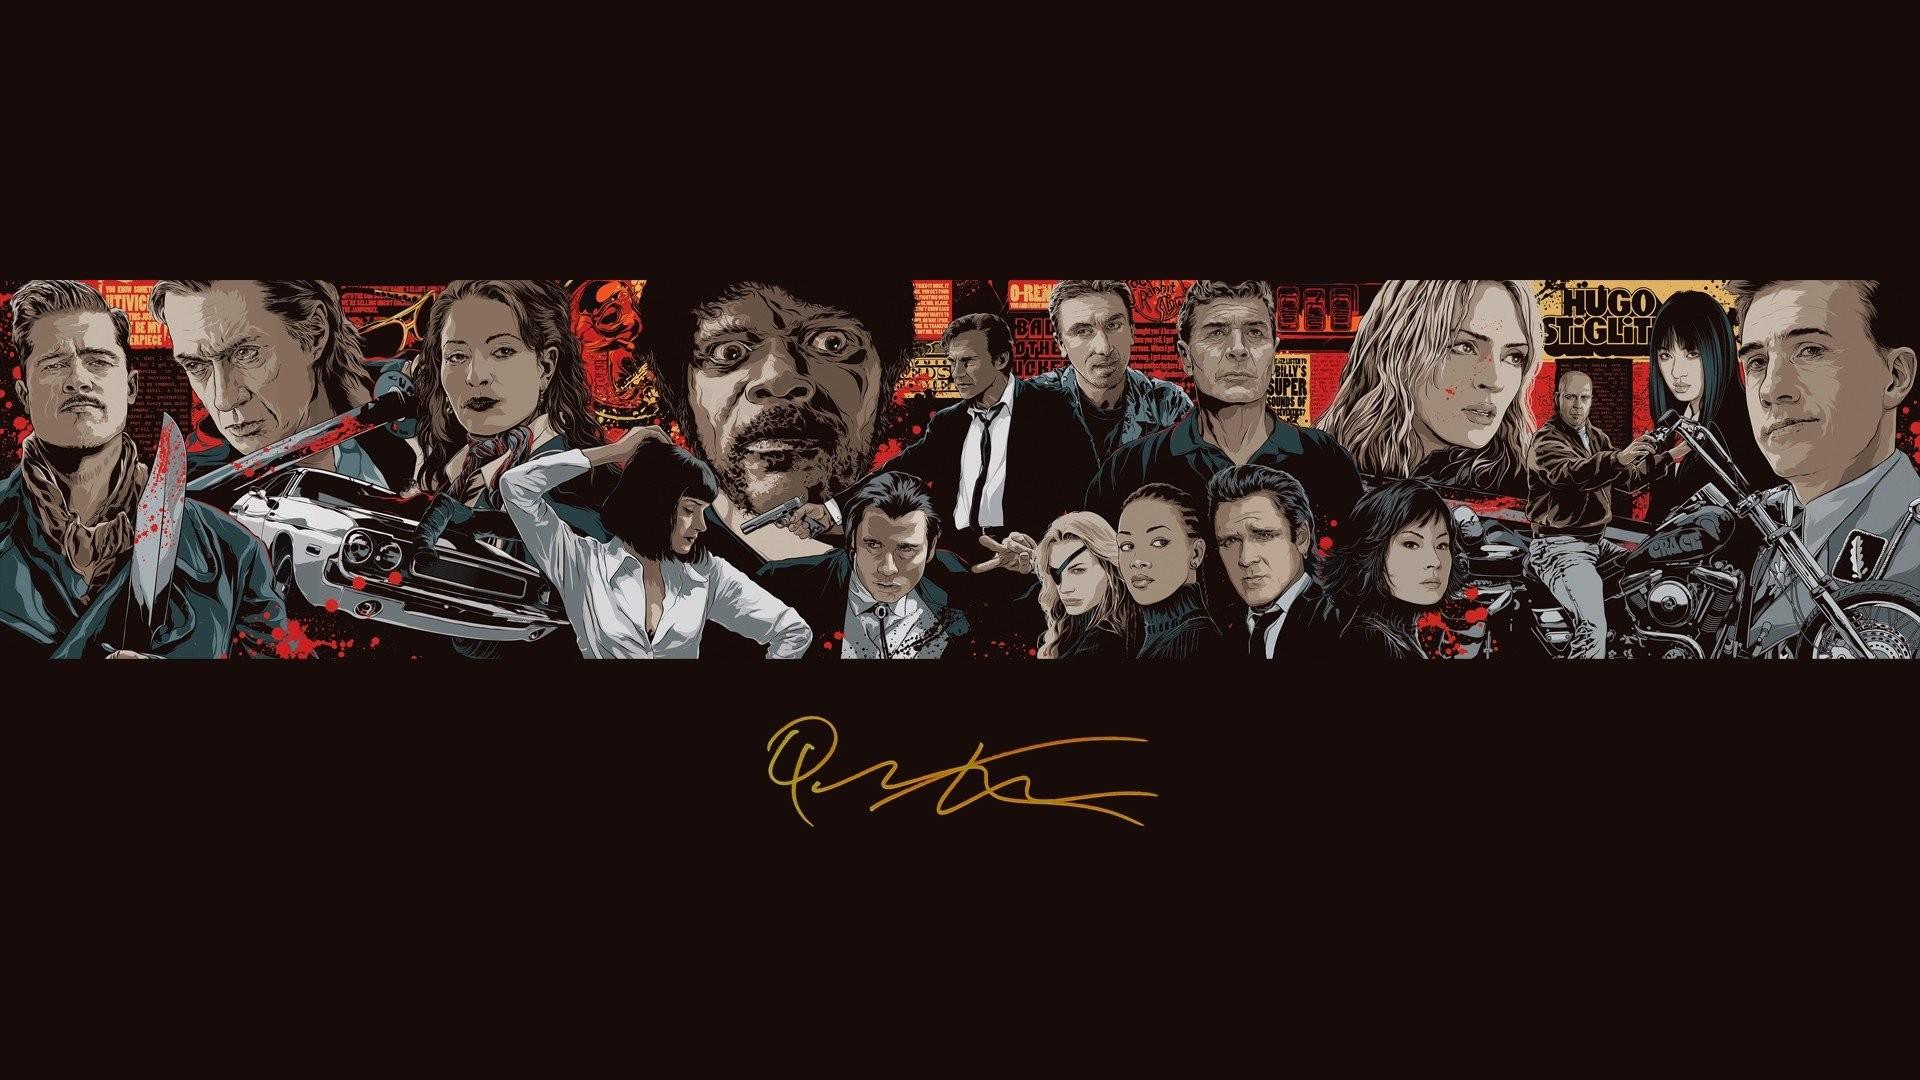 … Films Inglorious Basterds Jackie Brown John Travolta Kill Bill Lucy Liu  Pulp Fiction Quentin Tarantino Reservoir Dogs Samuel L. Jackson Uma Thurman